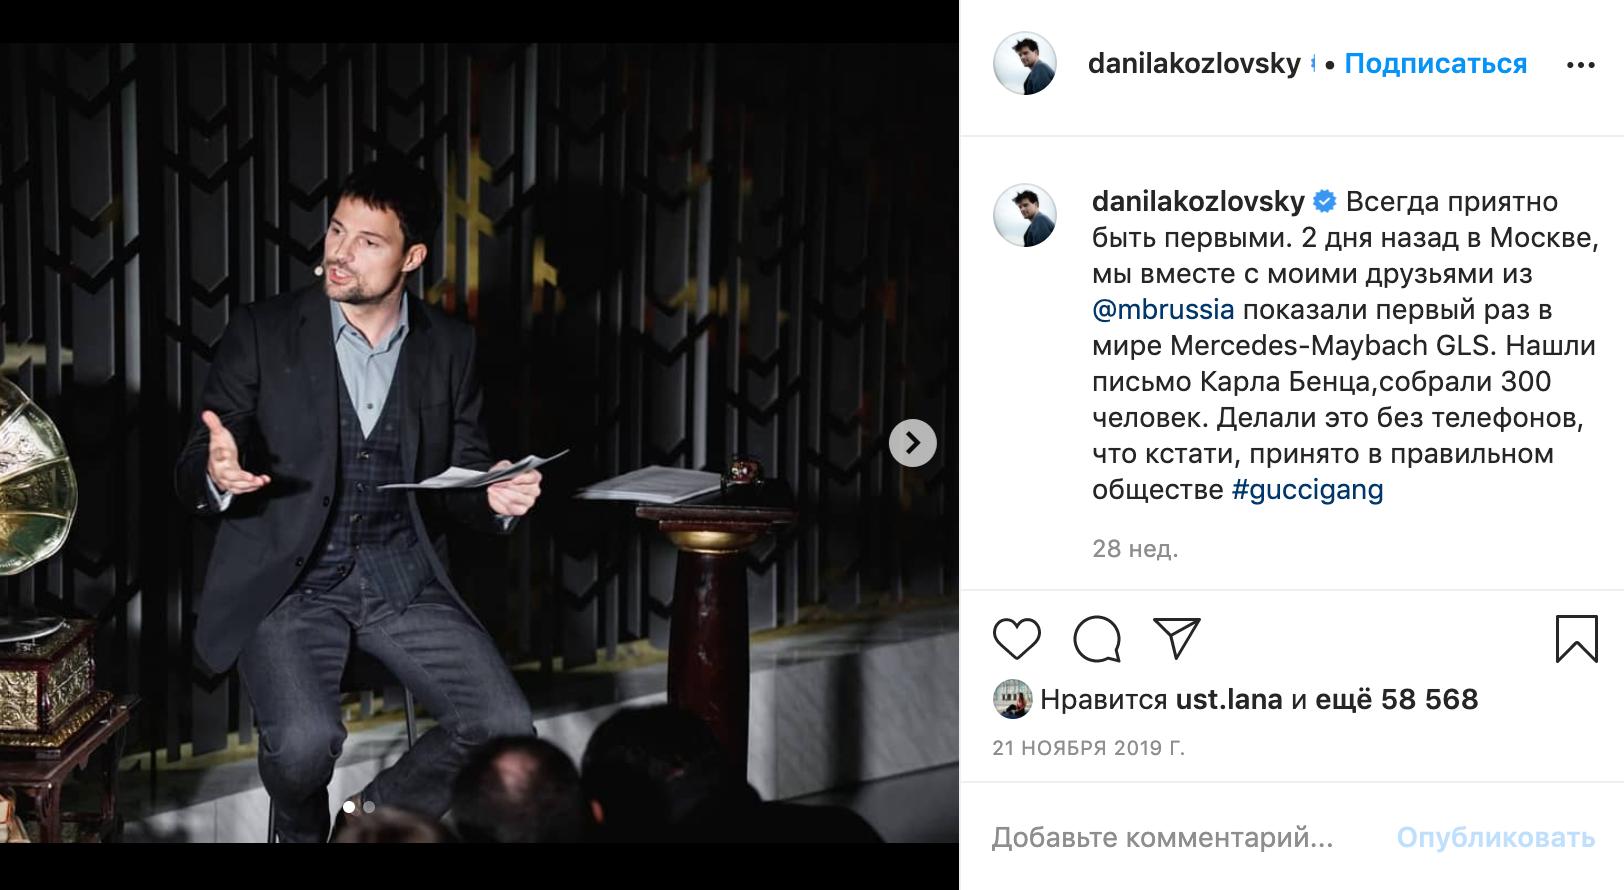 А вот Данила Козловский в костюме от Gucci на каком-то мероприятии. Актер — амбассадор этого бренда